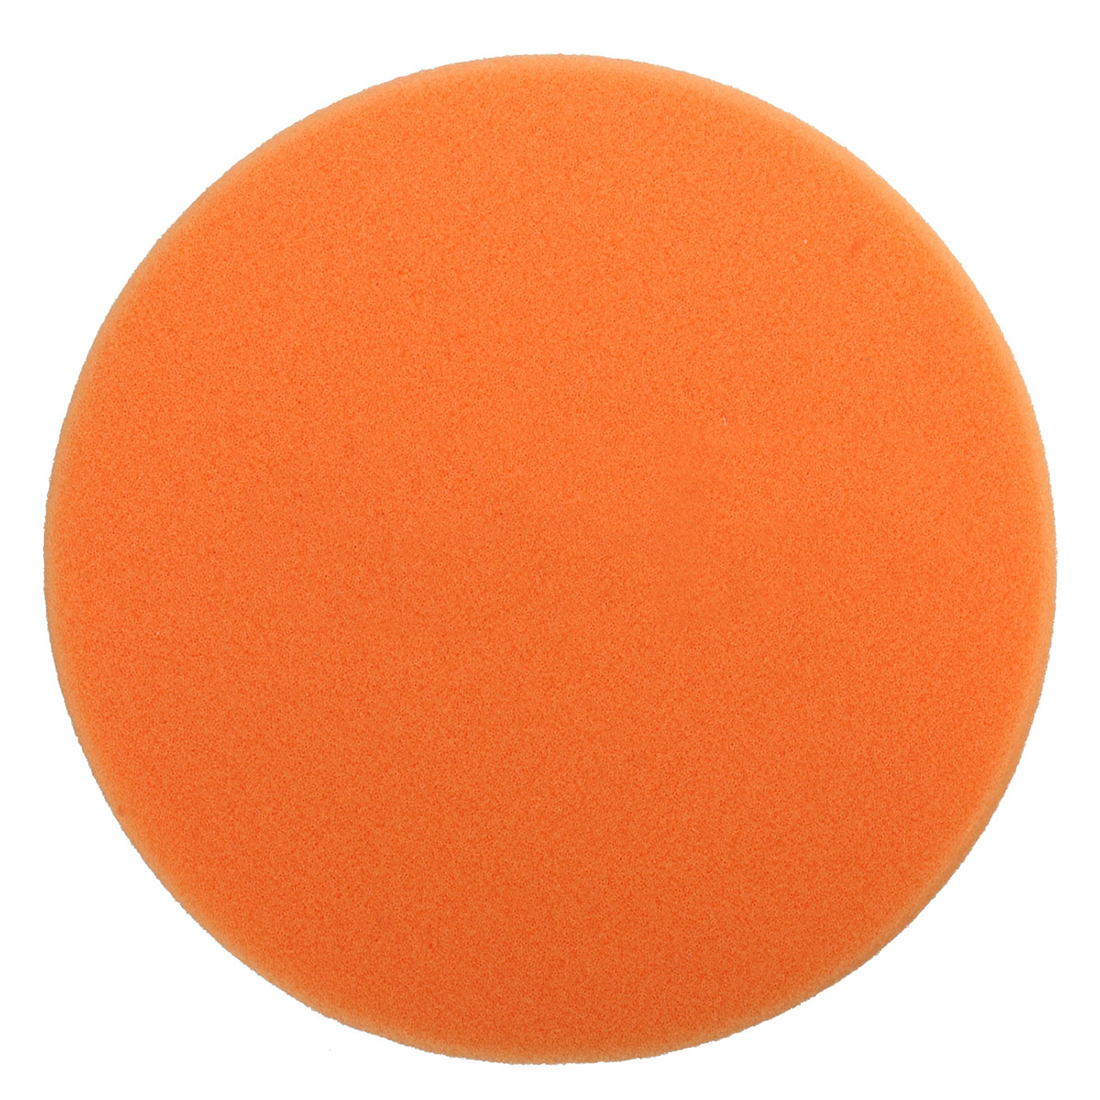 Aliexpress.com : Buy 6 Inch 150mm Soft Flat Sponge Buffer